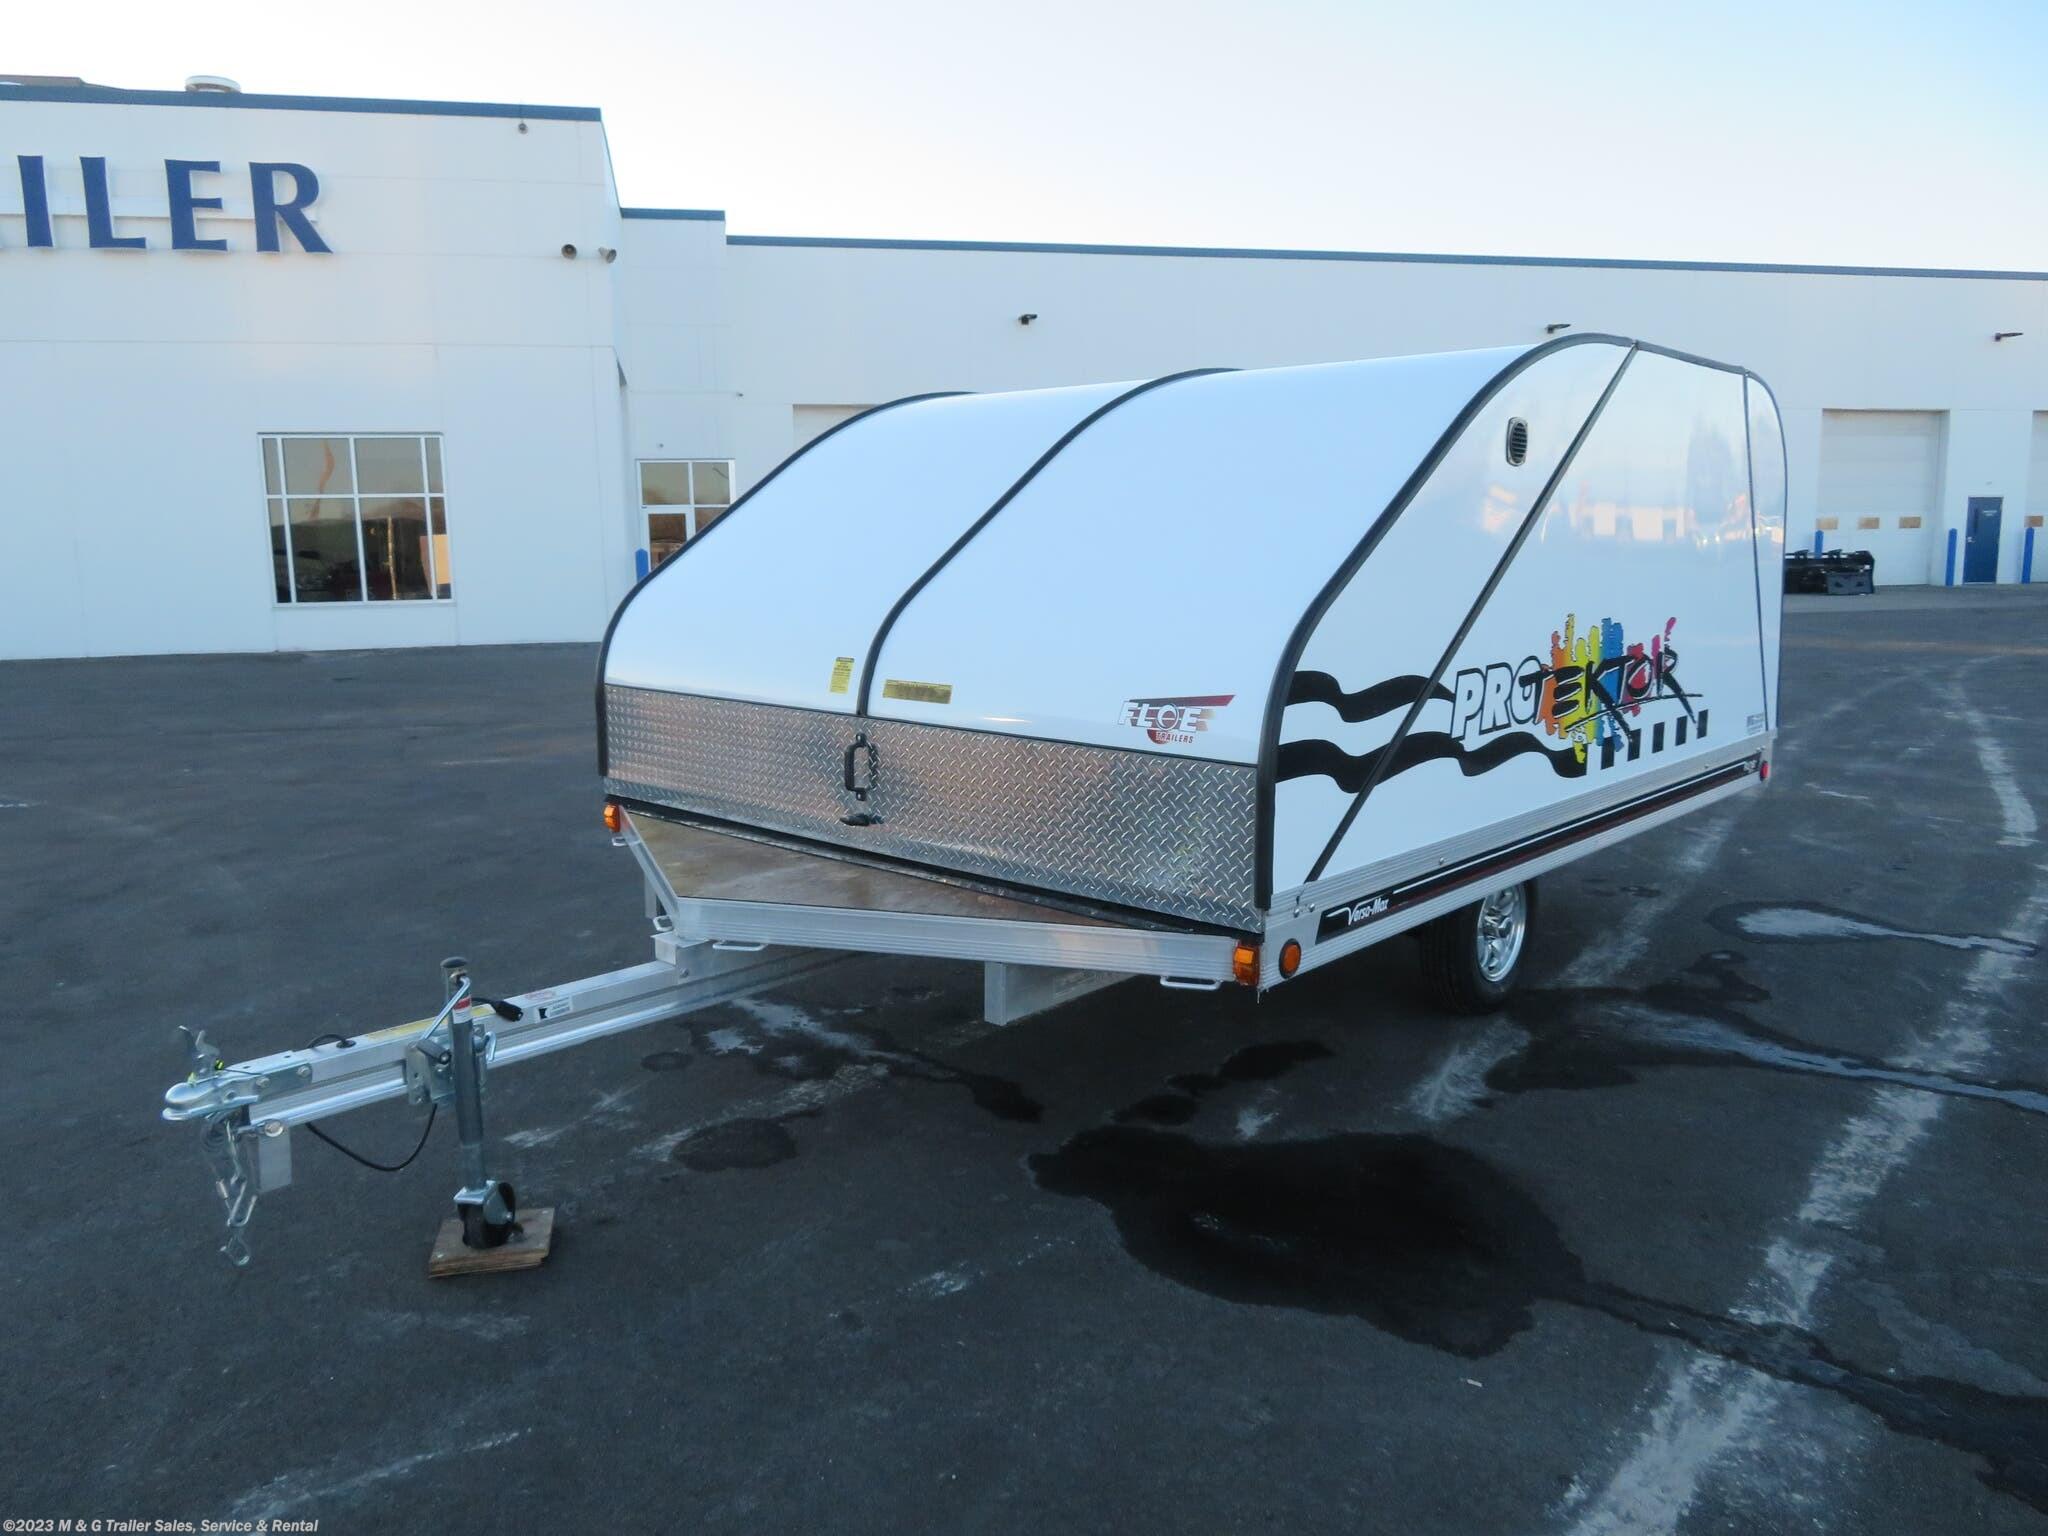 2020 FLOE 8.5x12 Protektor 2 Place Snowmobile Trailer - Stock #001032